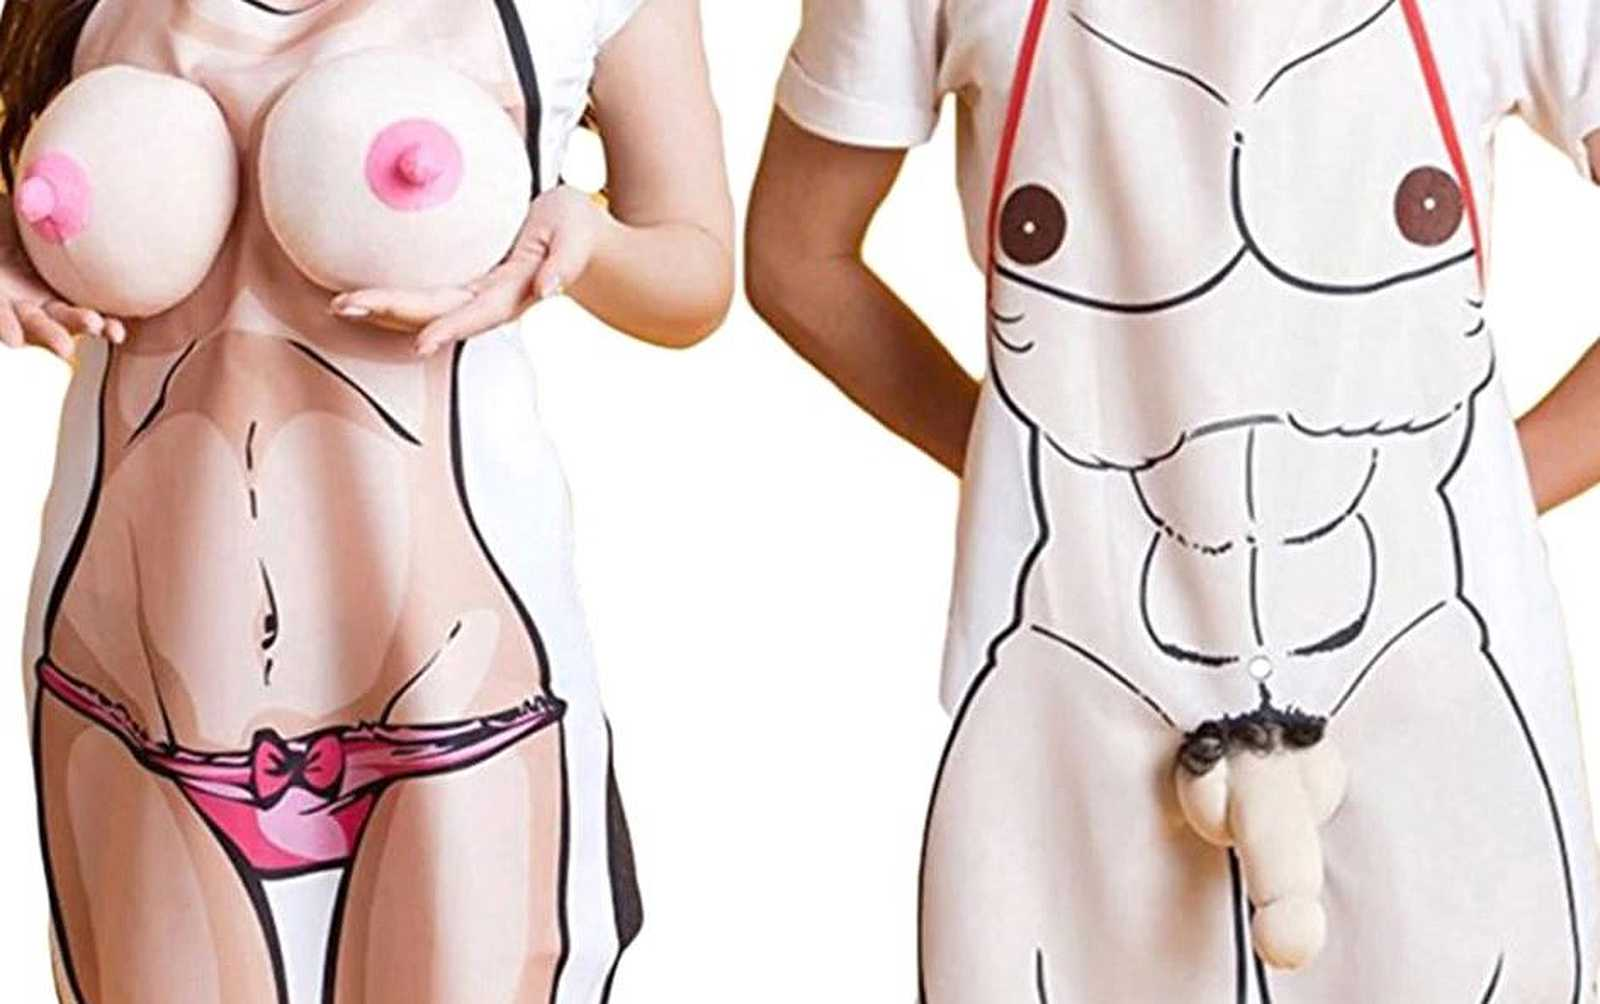 naked 3d apron